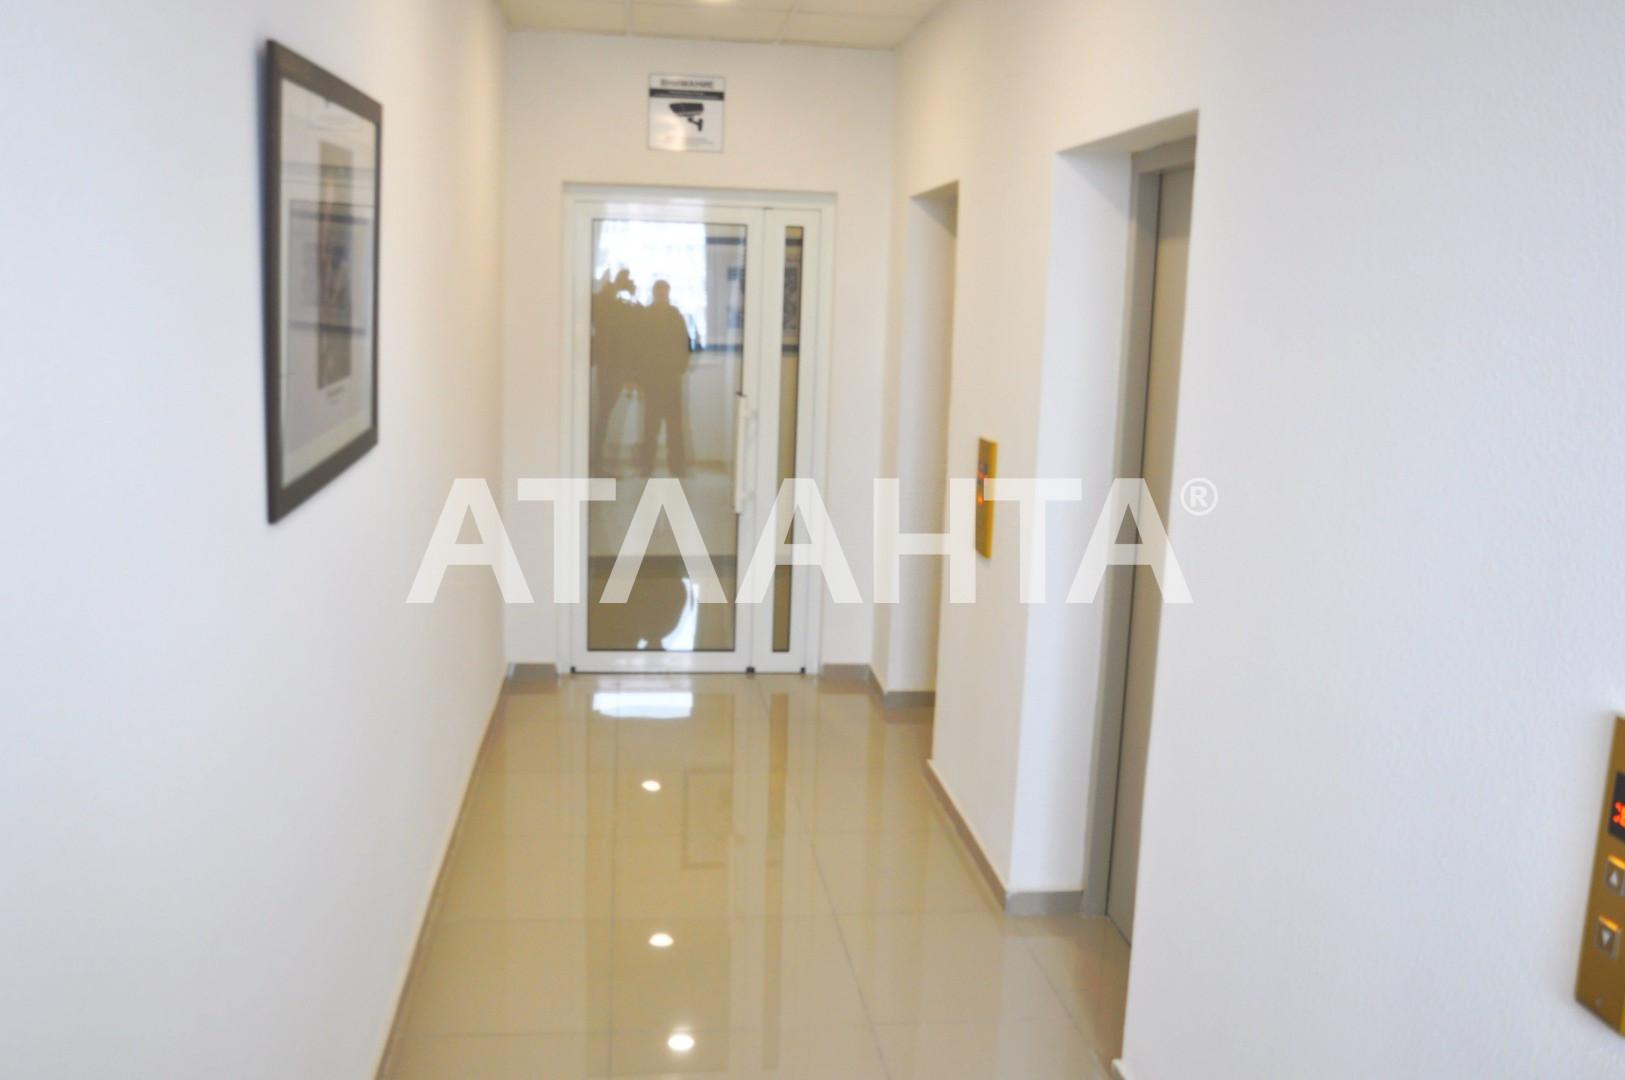 Продается 1-комнатная Квартира на ул. Генуэзская — 48 700 у.е. (фото №9)